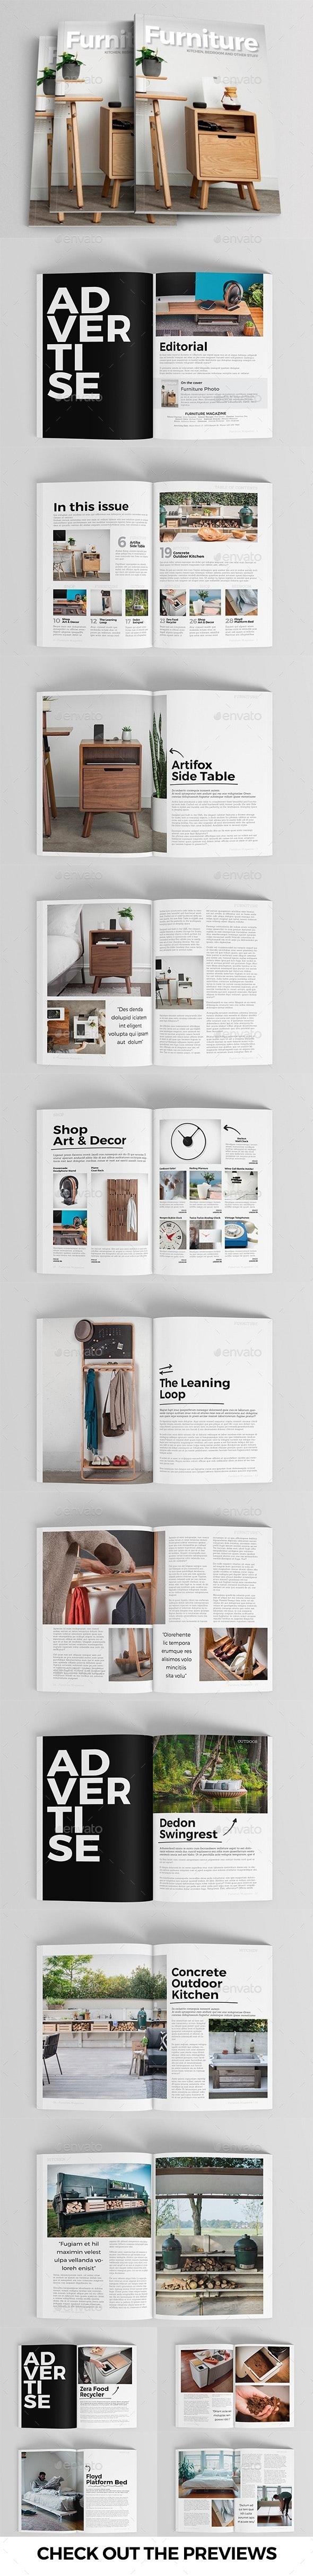 Furniture & Deco Magazine Template - Magazines Print Templates